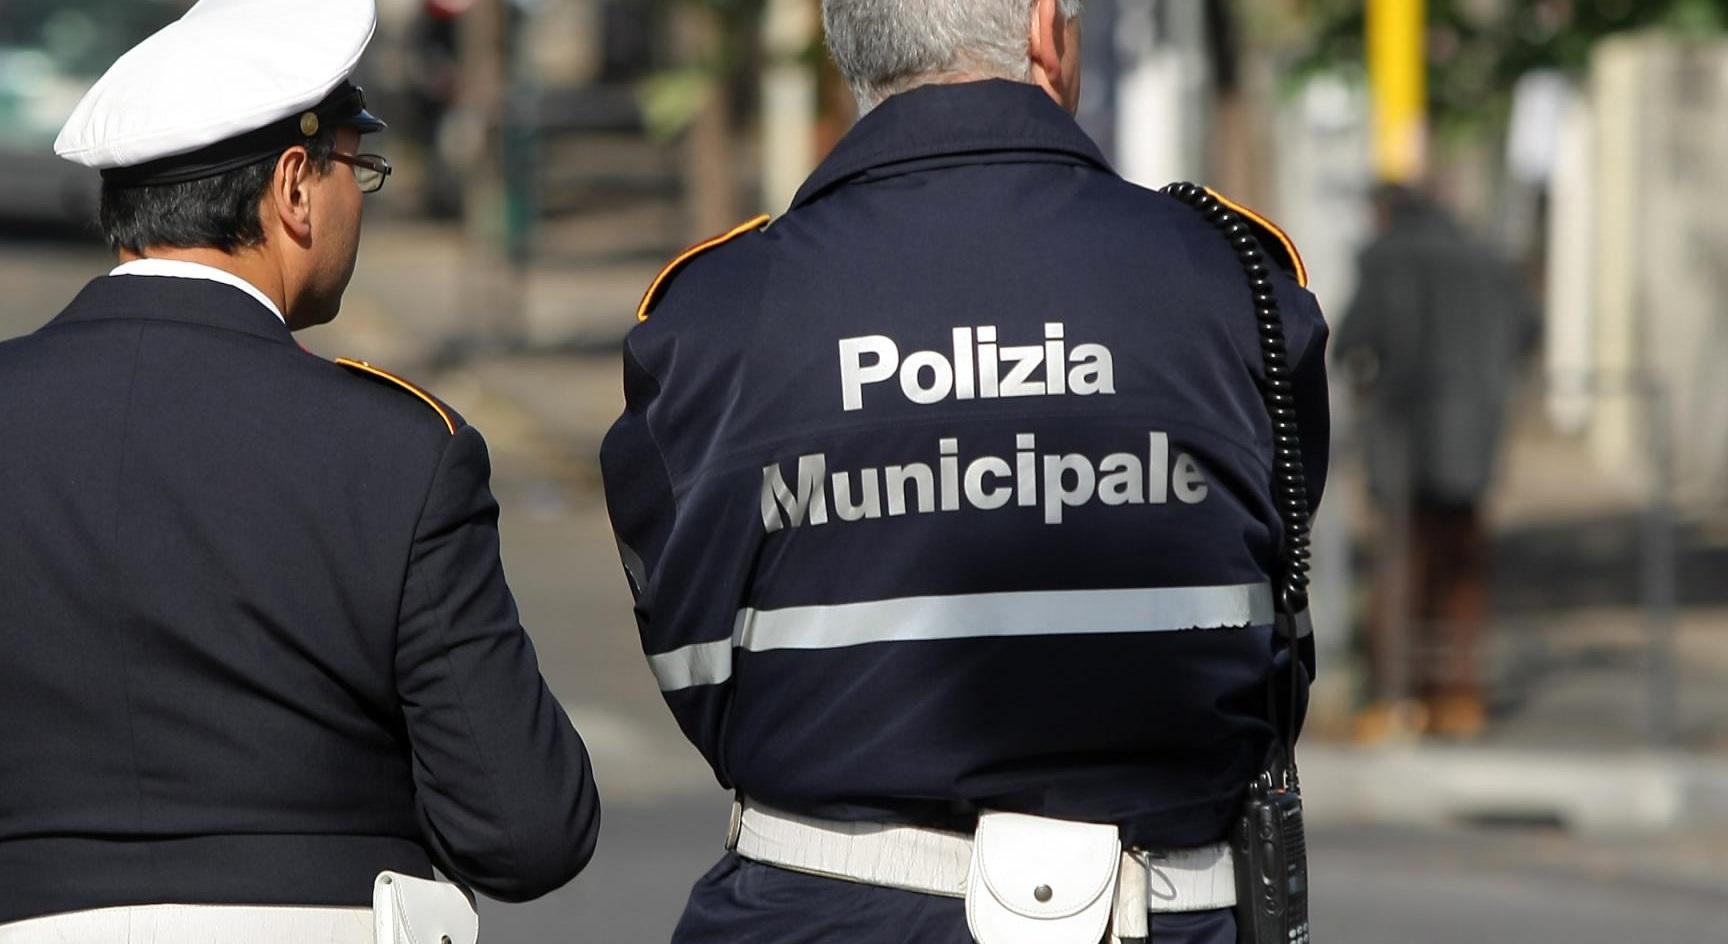 Furbetti cartellino: sospesi tre vigili urbani ad Avellino